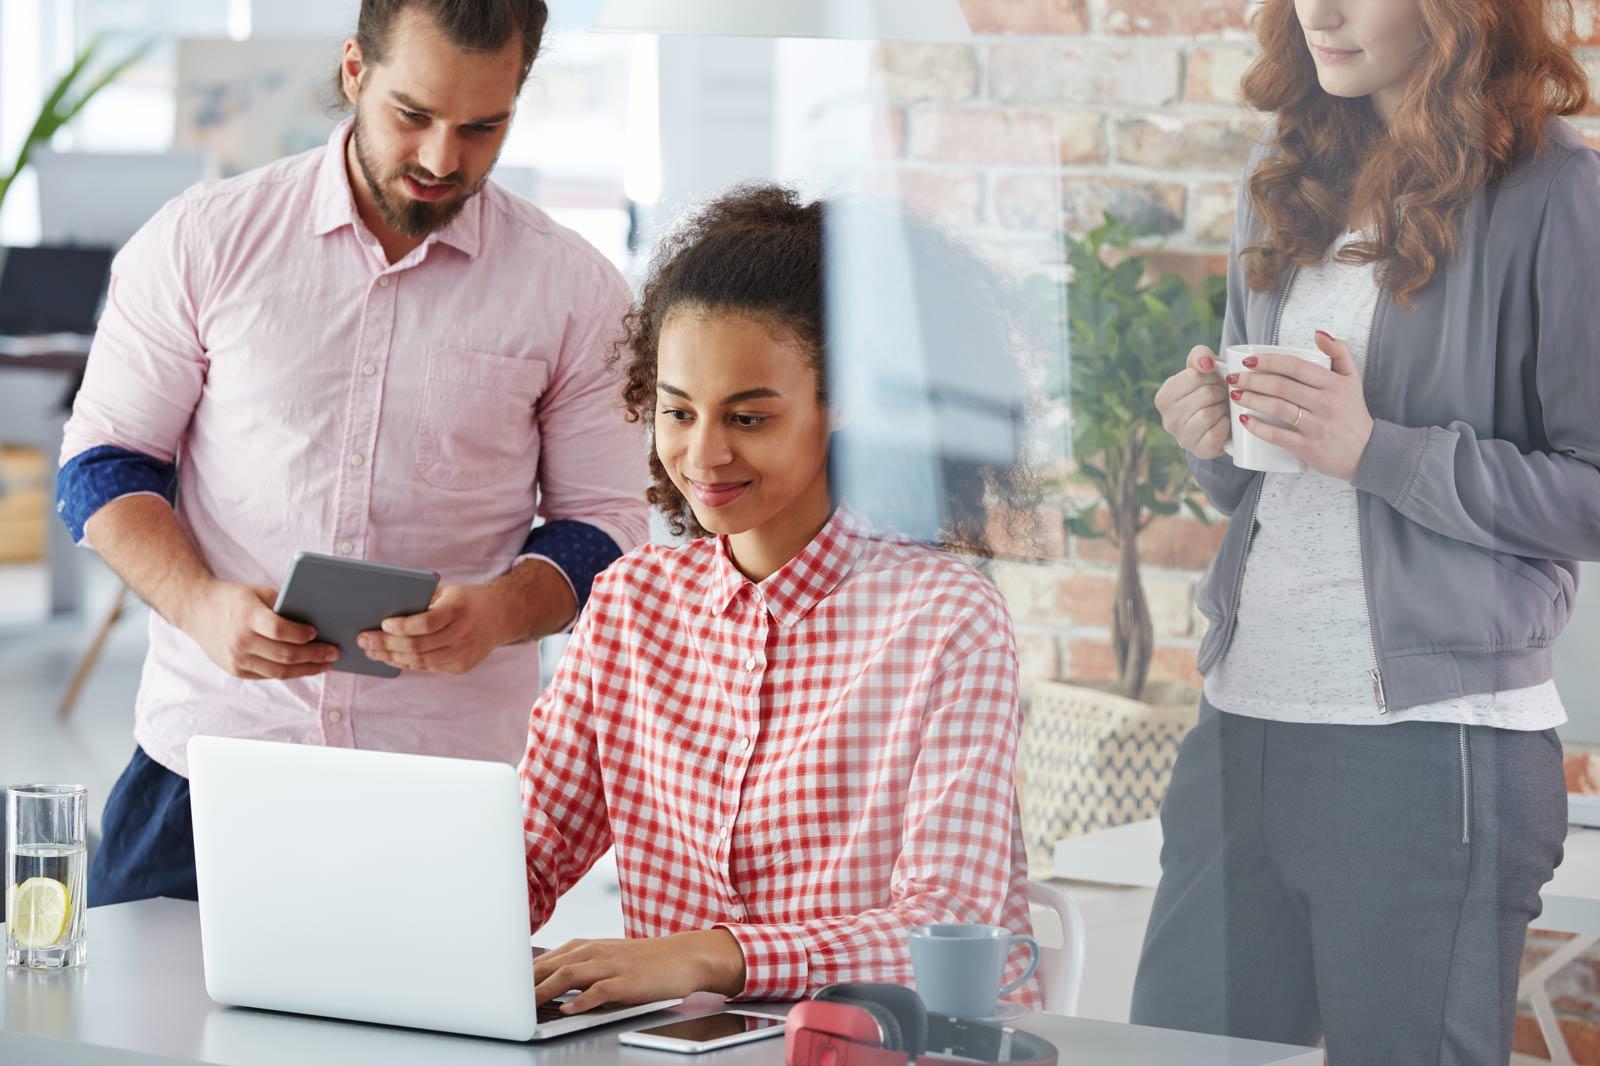 employee leasing vs co-employment